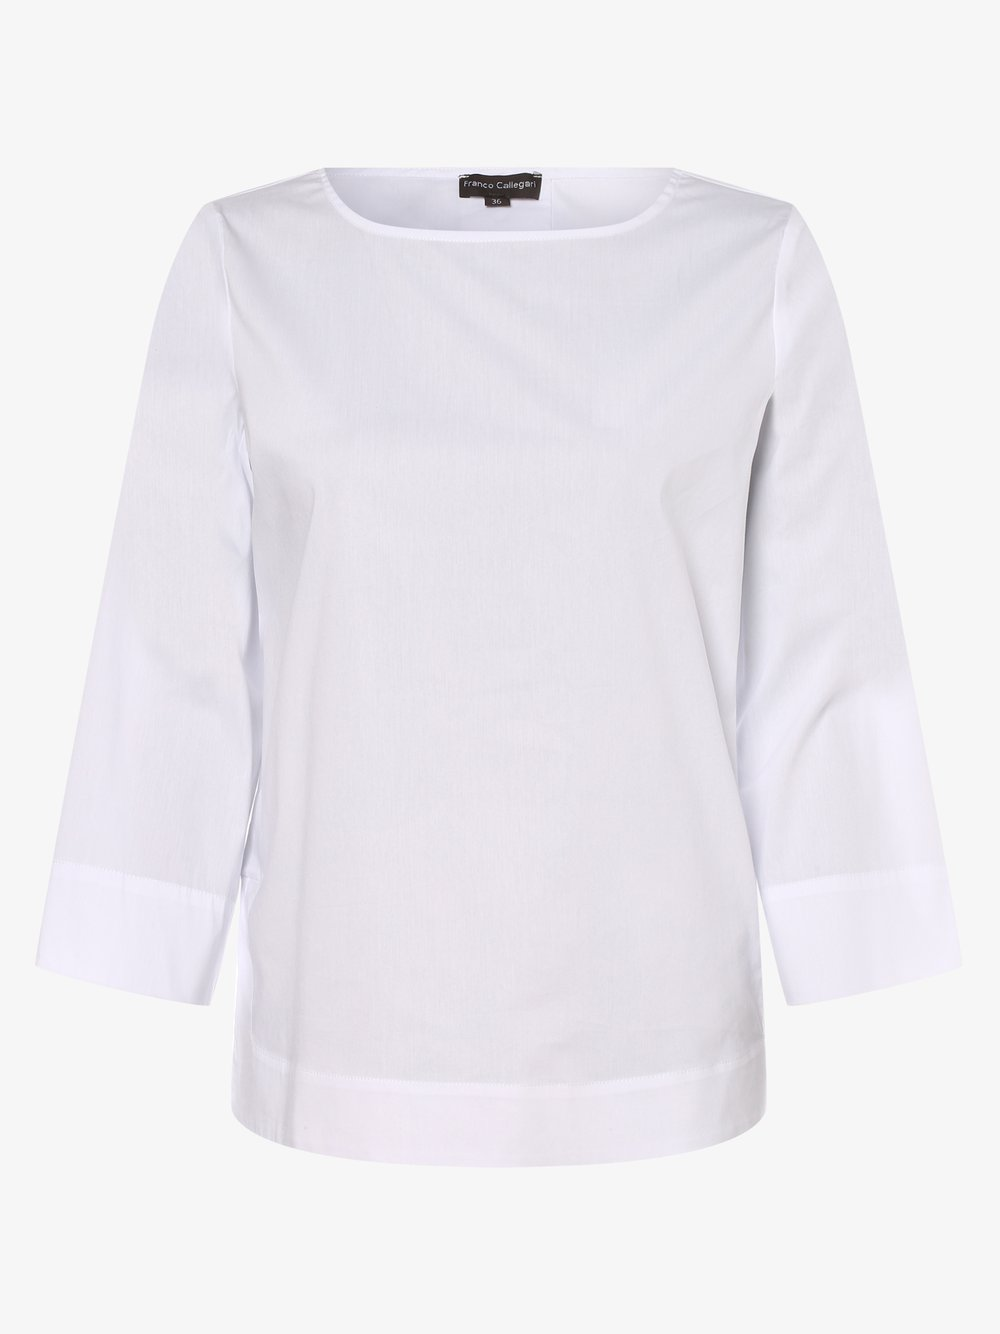 Franco Callegari – Bluzka damska, biały Van Graaf 476888-0001-00460